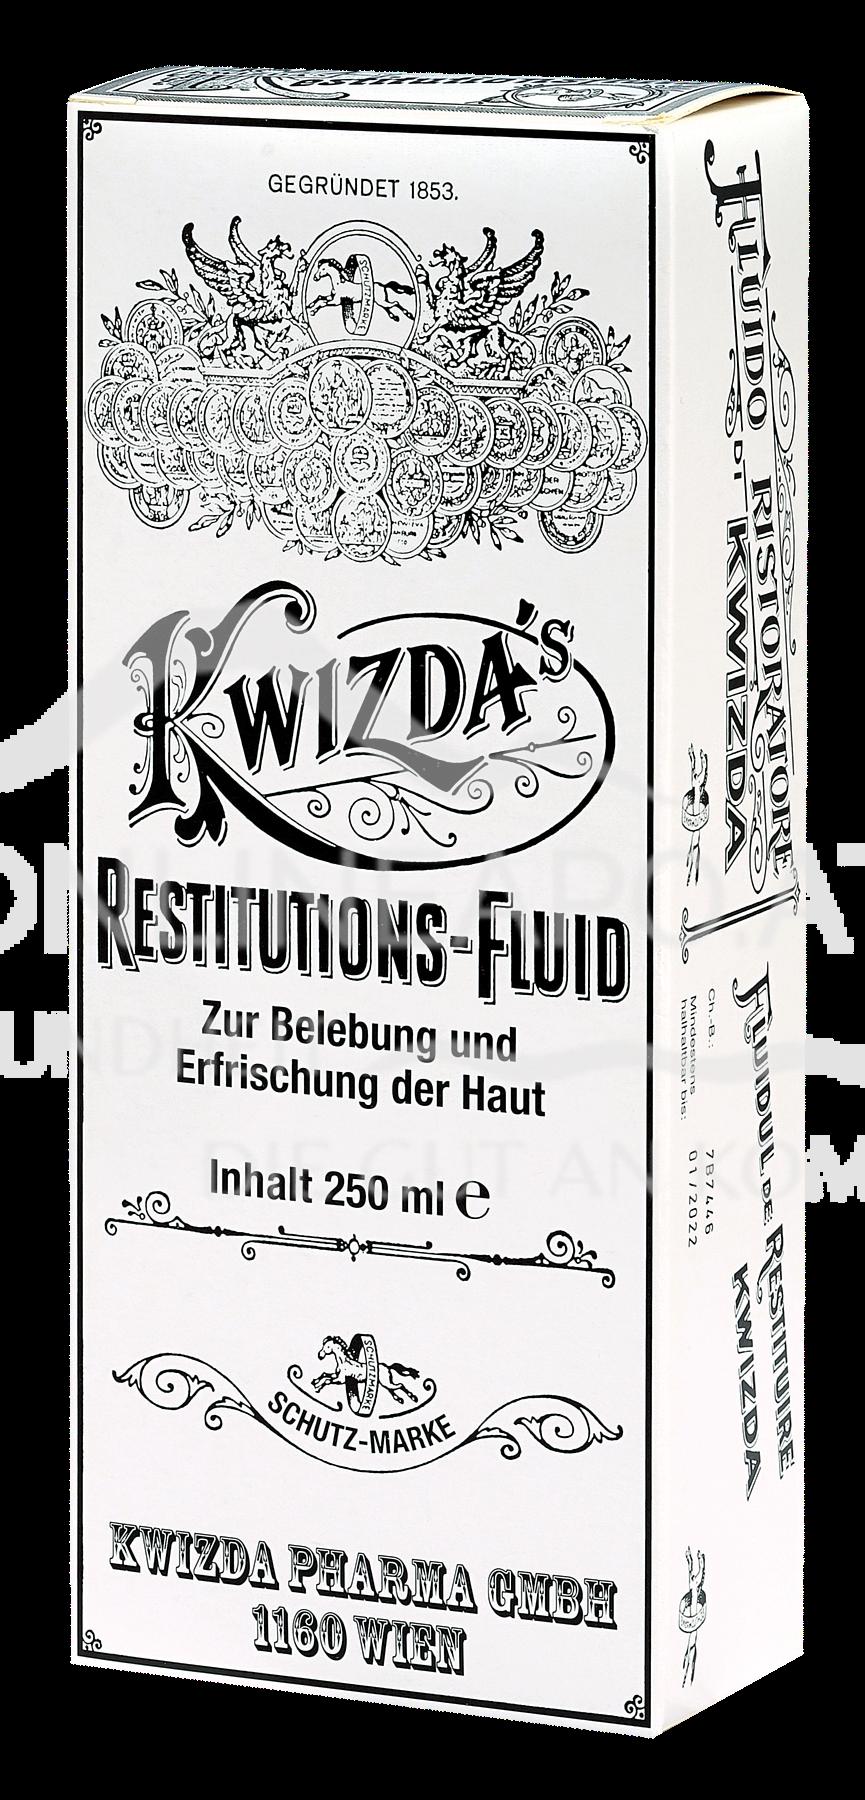 Kwizda's Restitutionsfluid